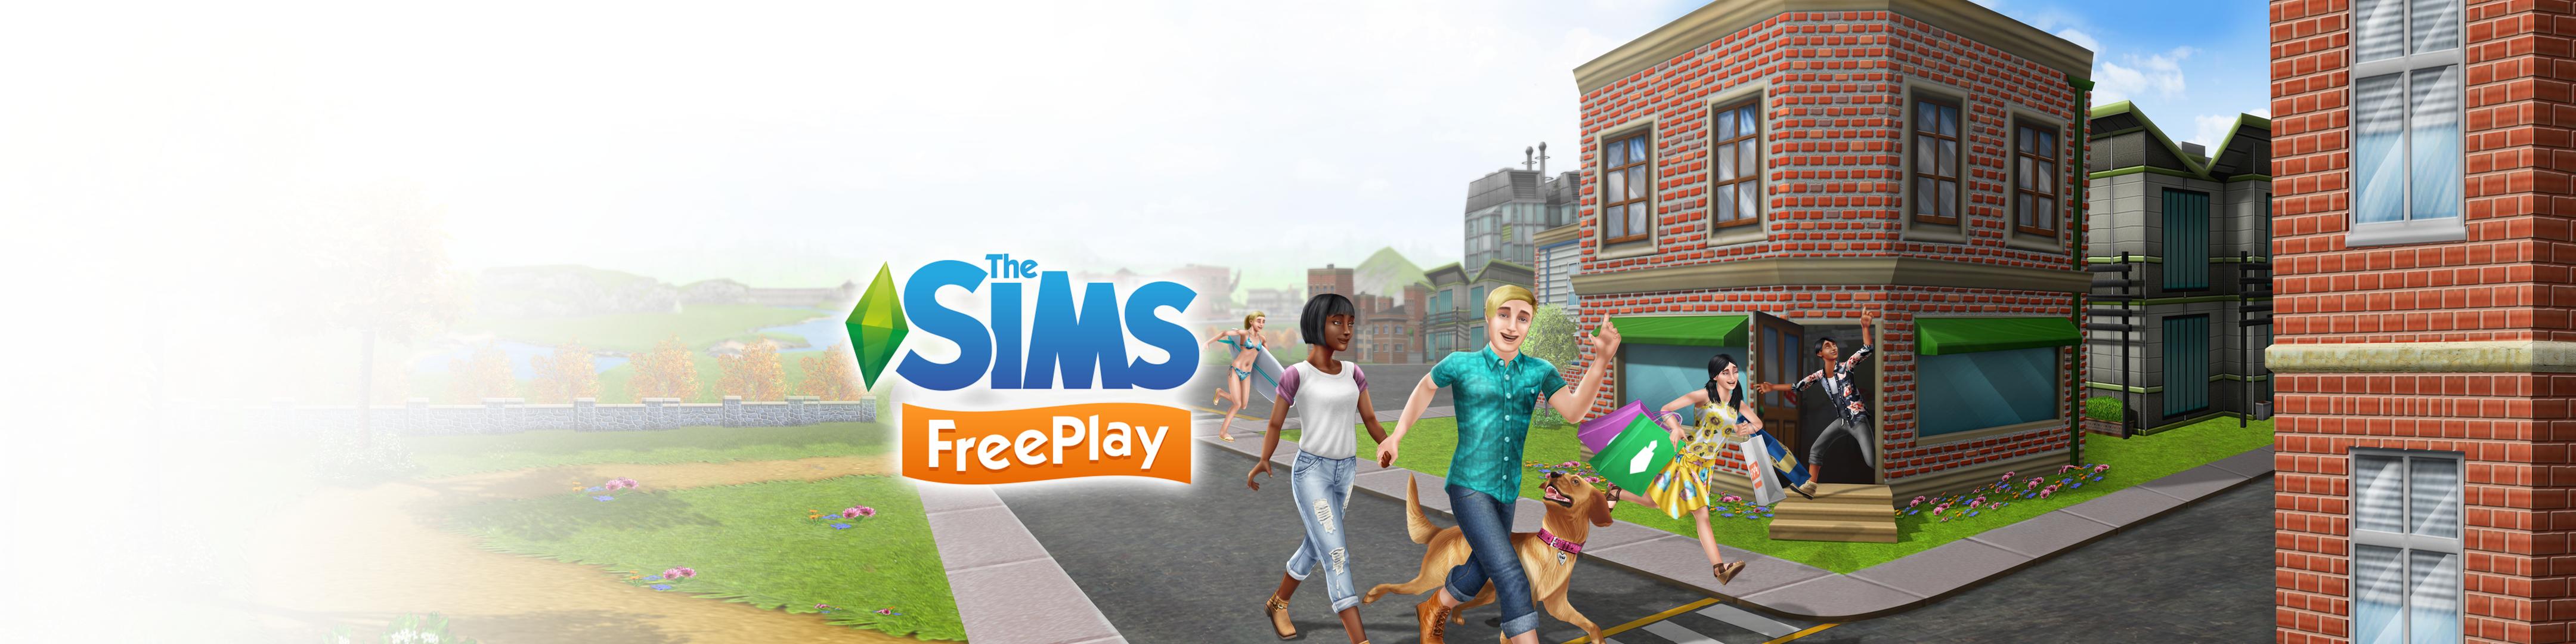 The Sims™ FreePlay - Revenue & Download estimates - Apple